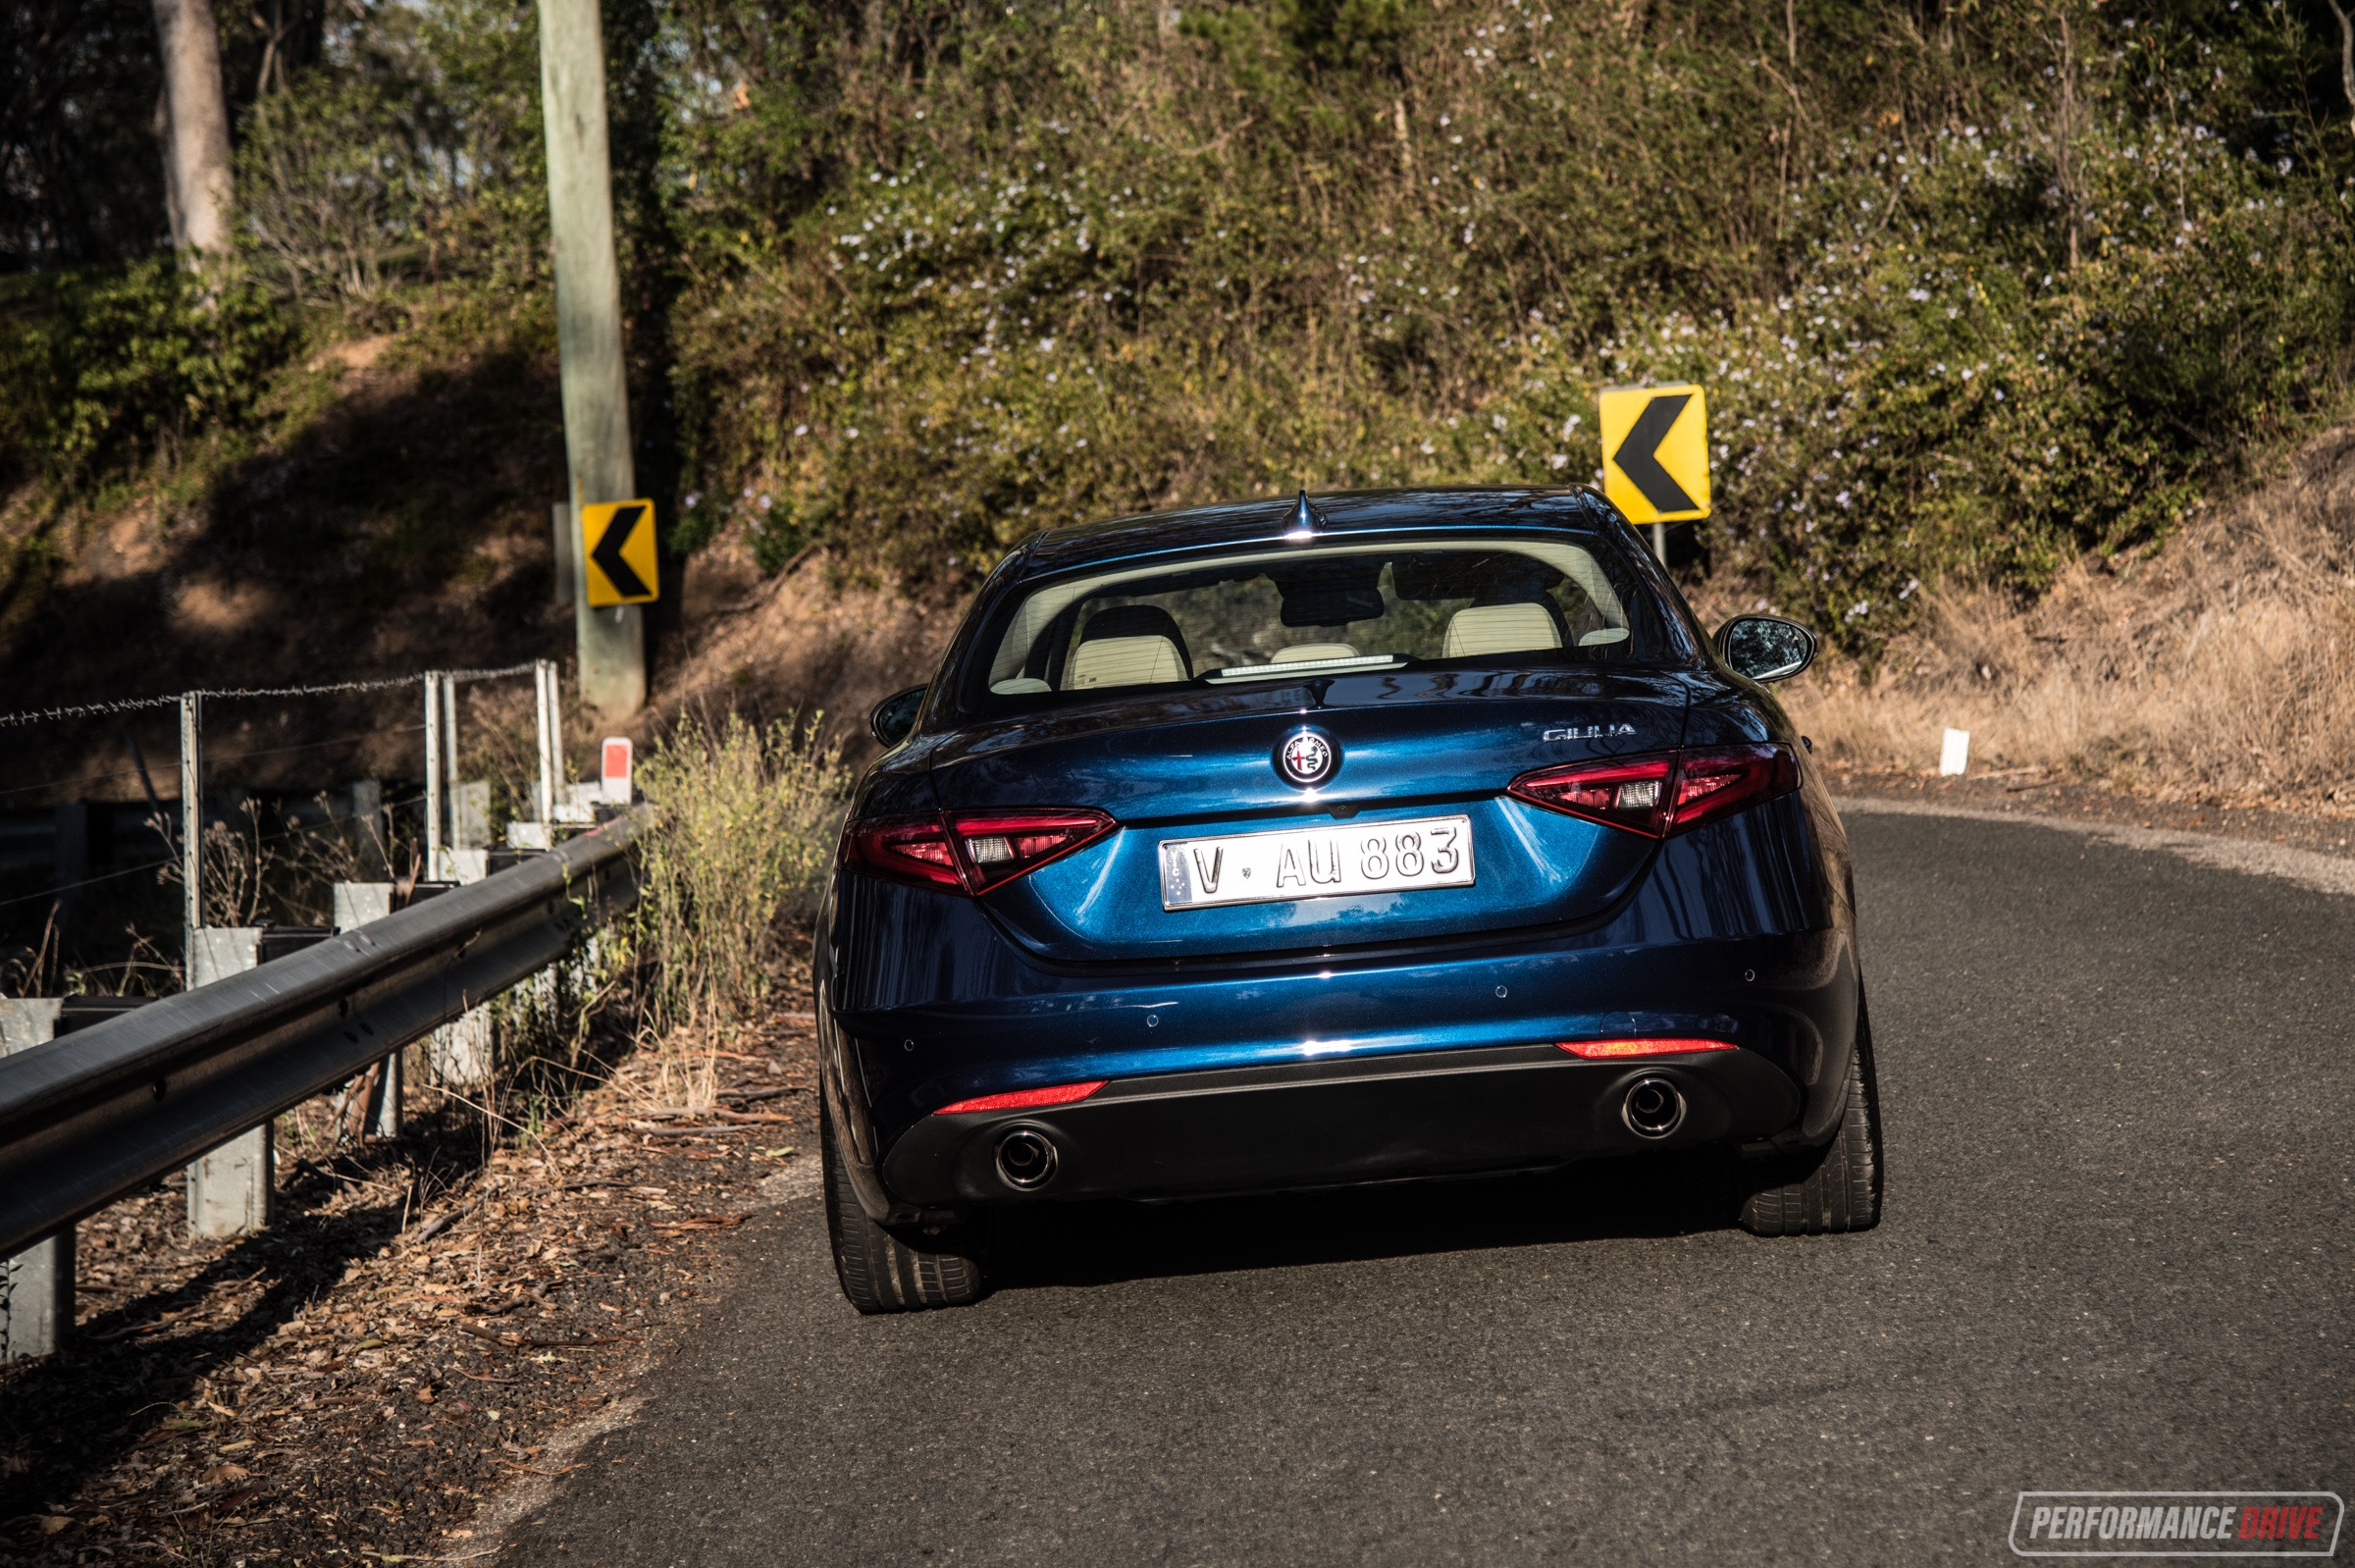 2018 Alfa Romeo Giulia Super Diesel Video Performancedrive Tail Lights Taillights